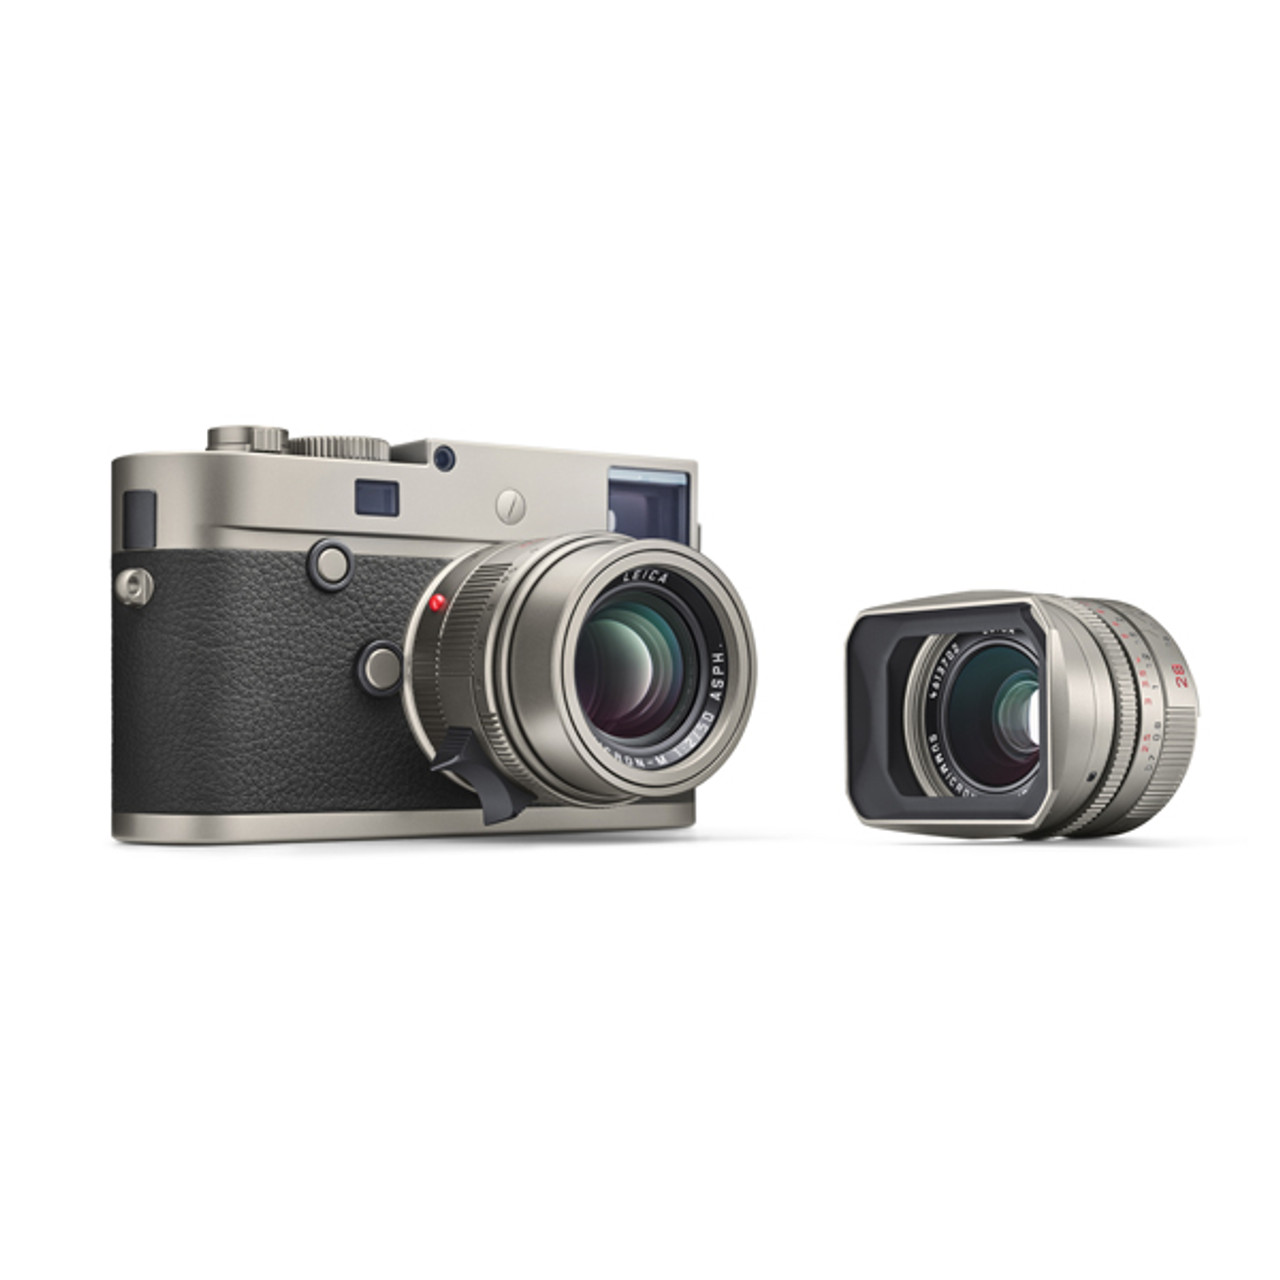 Leica M-P (Typ 240) Titanium Set - Broadway Camera